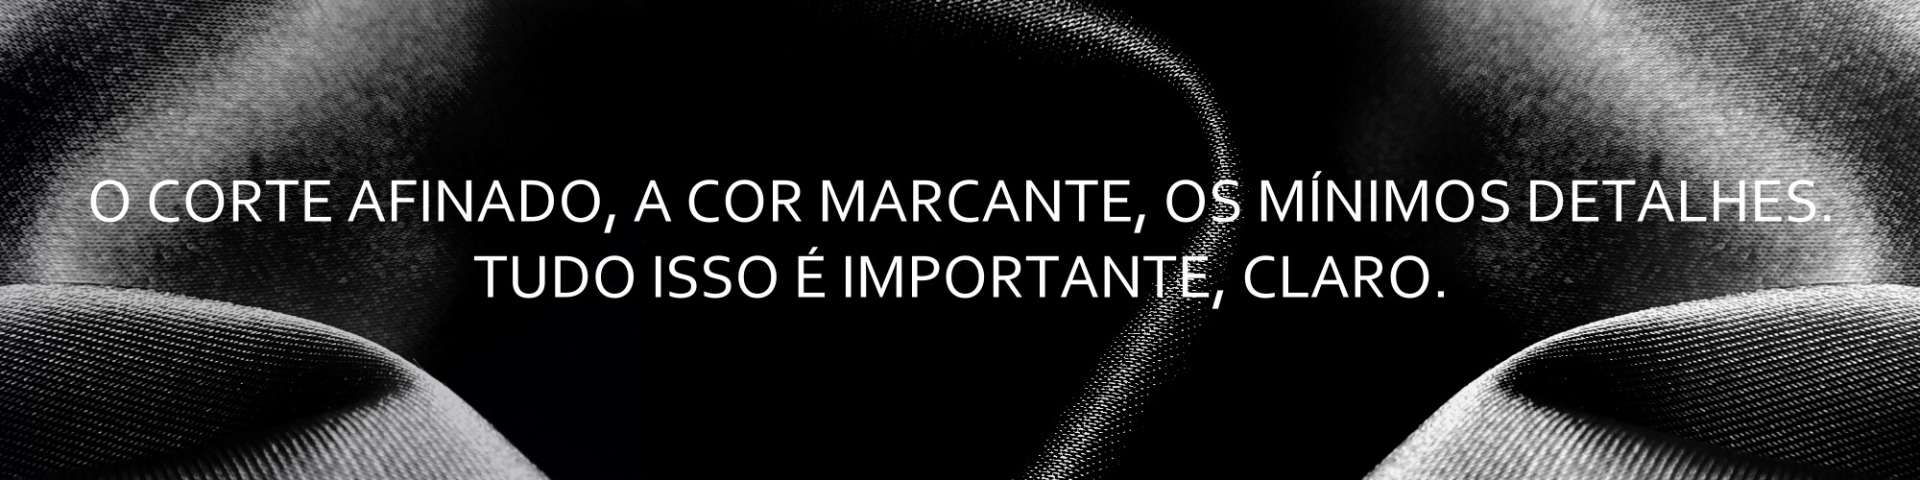 Manifesto - Benne - Gramado